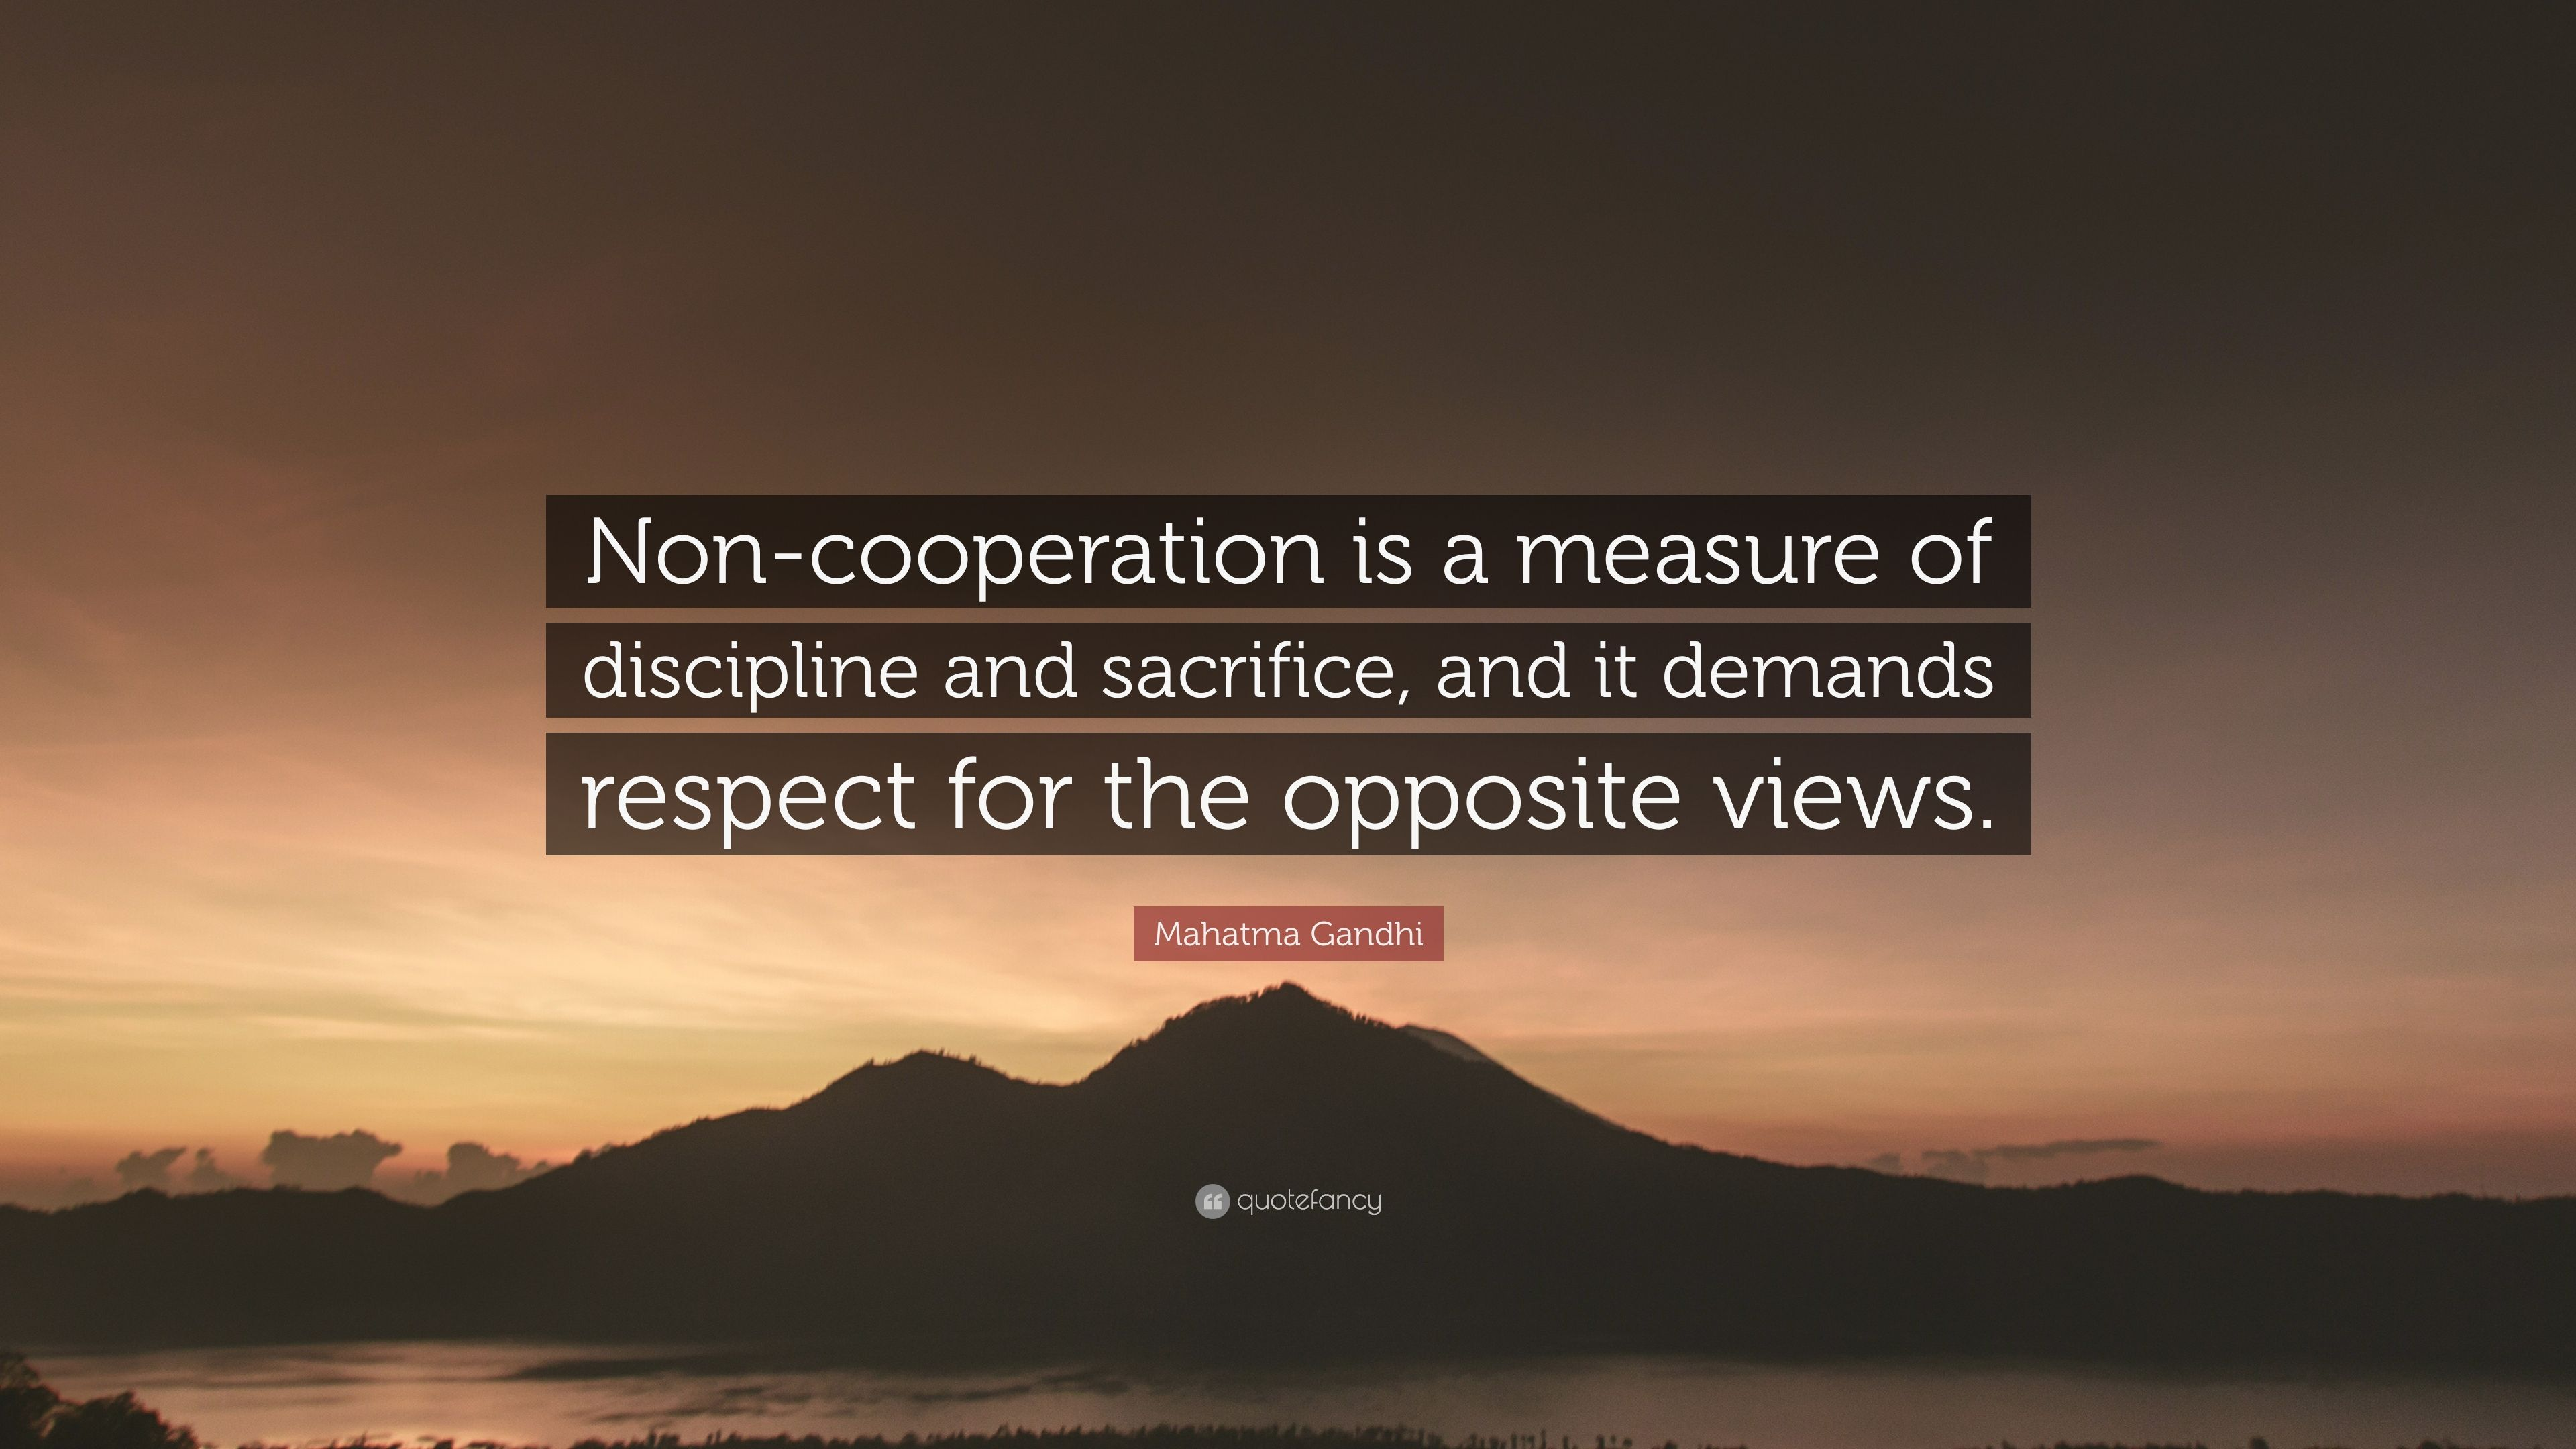 Mahatma Gandhi Quote Non Cooperation Is A Measure Of Discipline